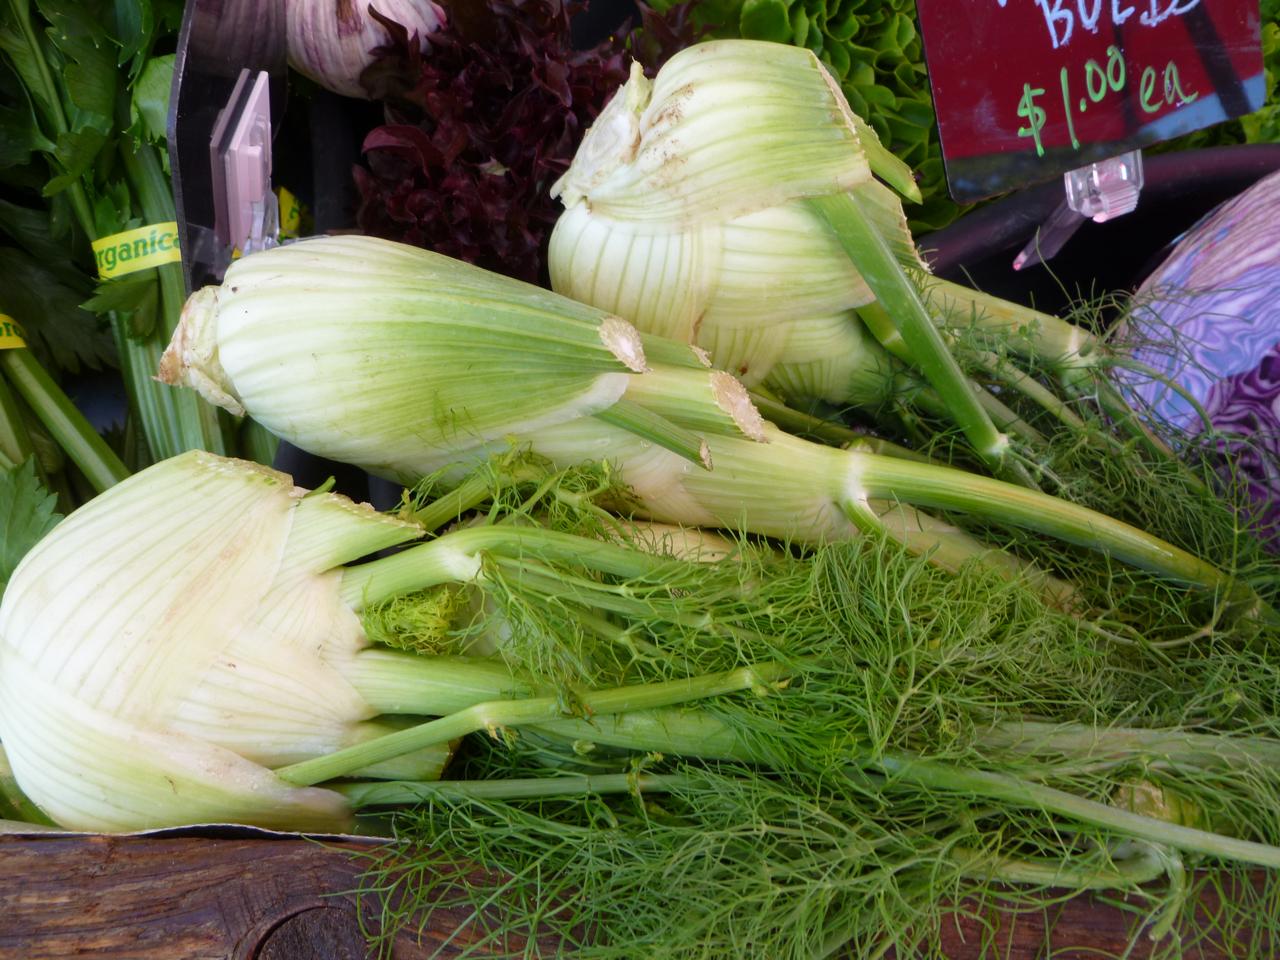 Fairmount Neighborhood Farmers Market: Fennel and Sardine Pasta